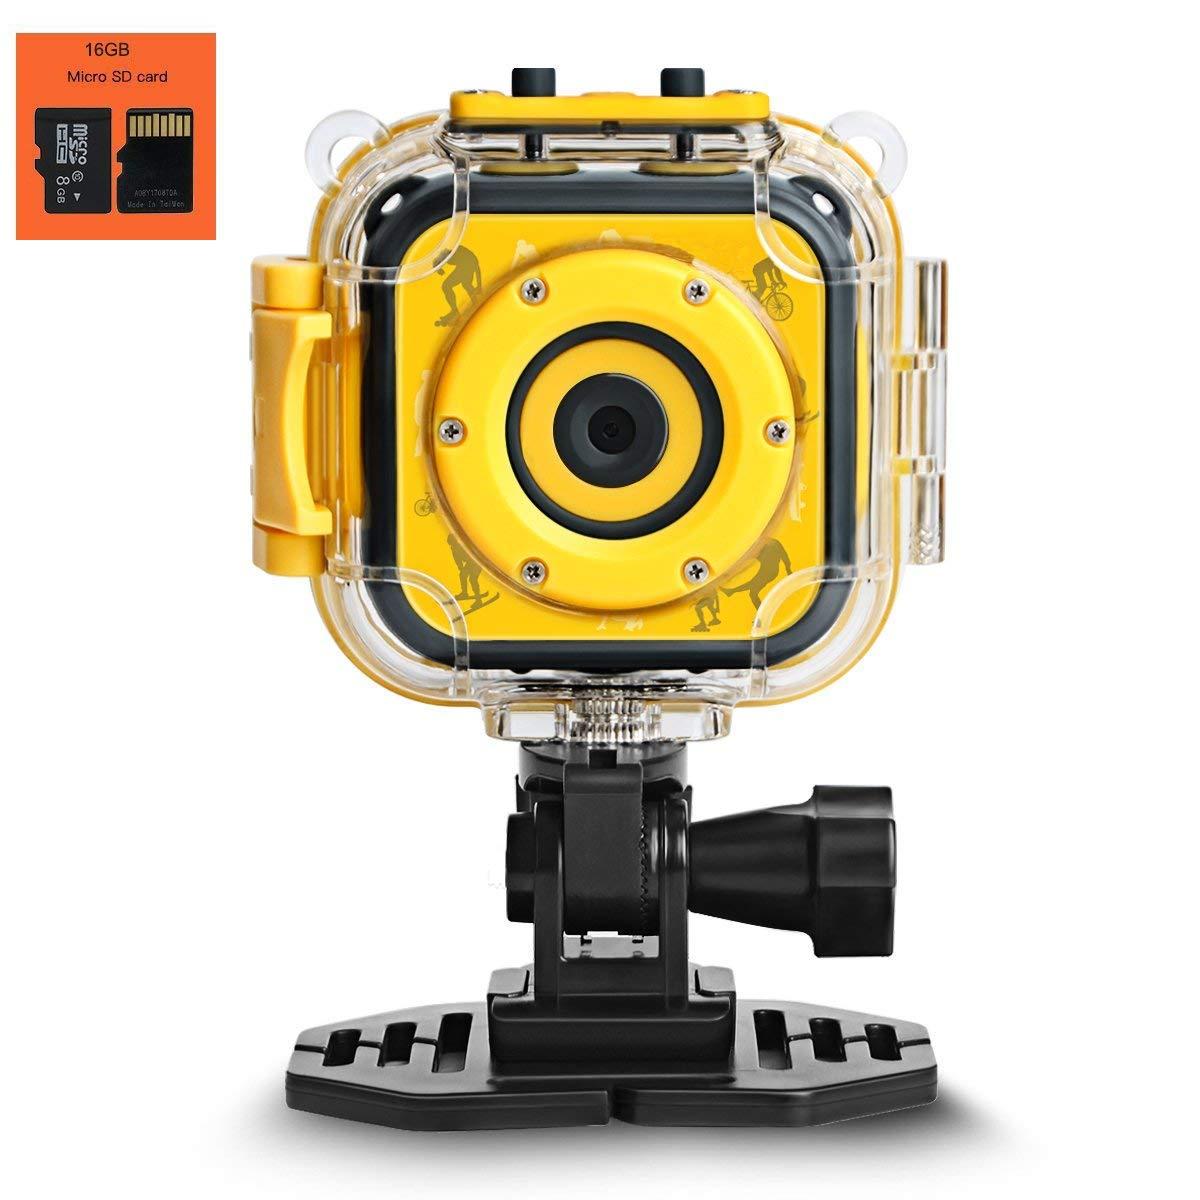 Spmywin Children Kids Action Camera Digital Video HD Camcorder DV Waterproof 20mWater Depth Available best gift for children